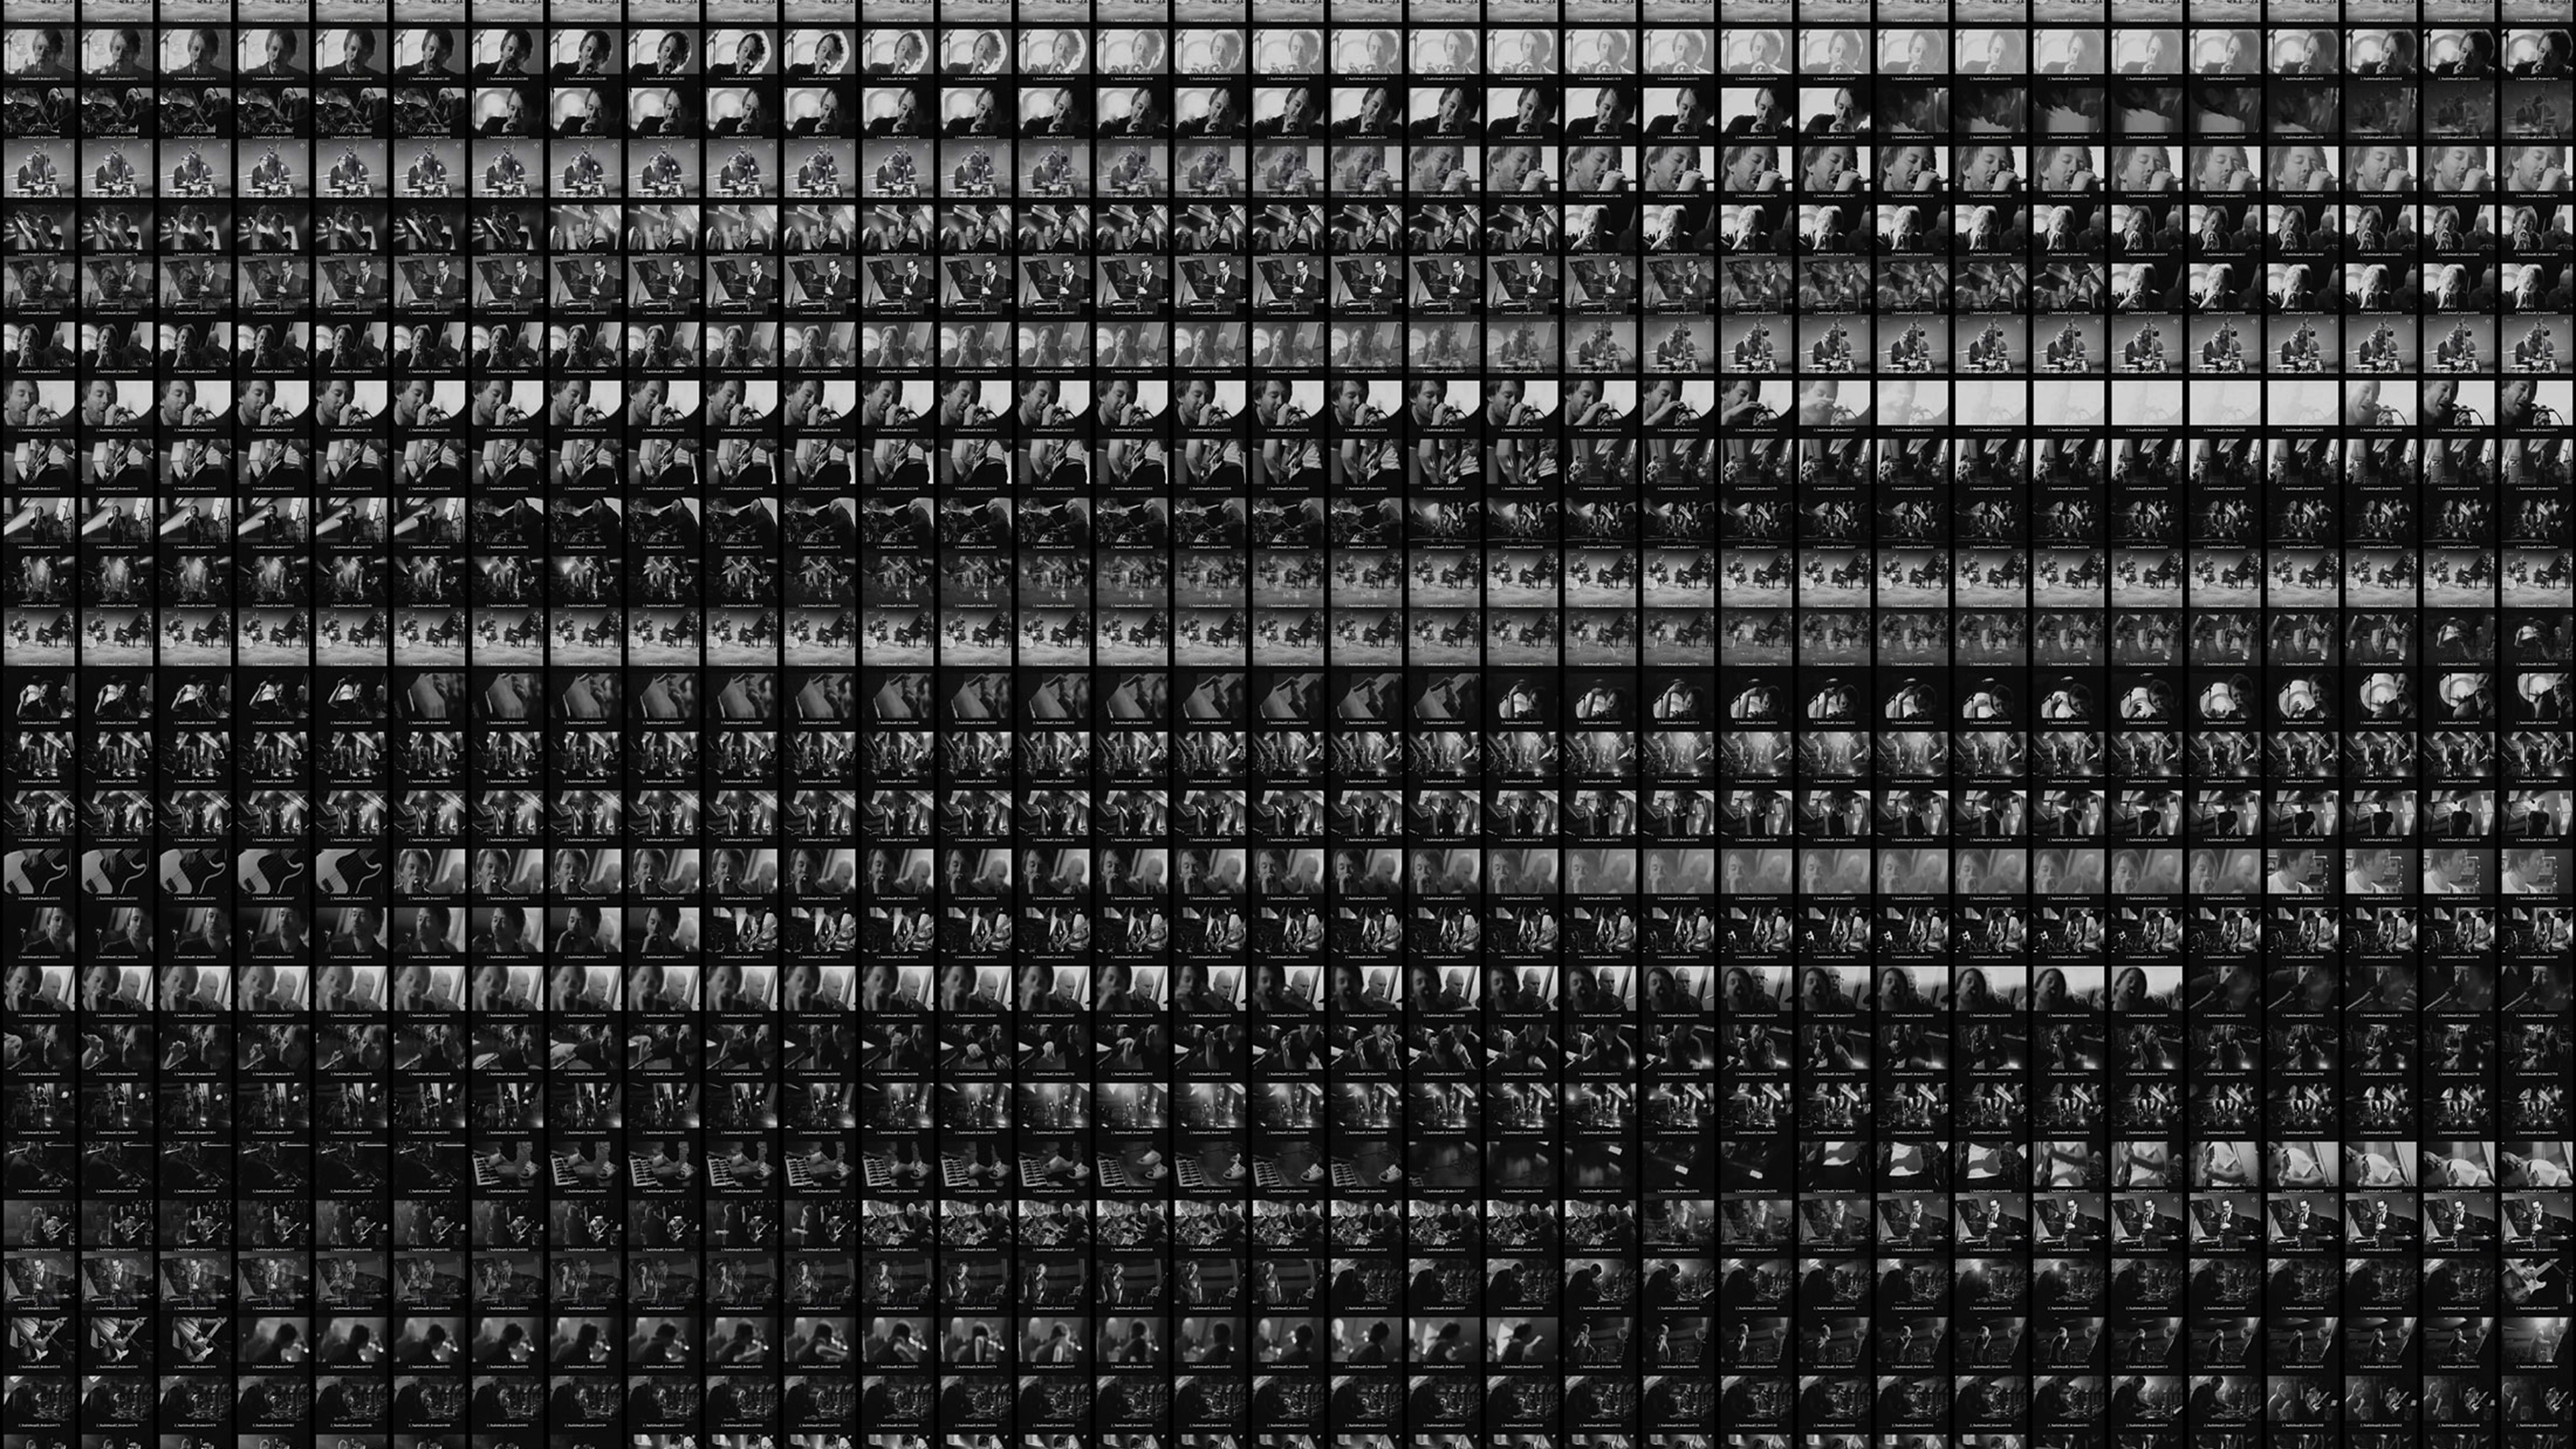 vo01-cinema-screen-square-pattern-dark-bw-wallpaper